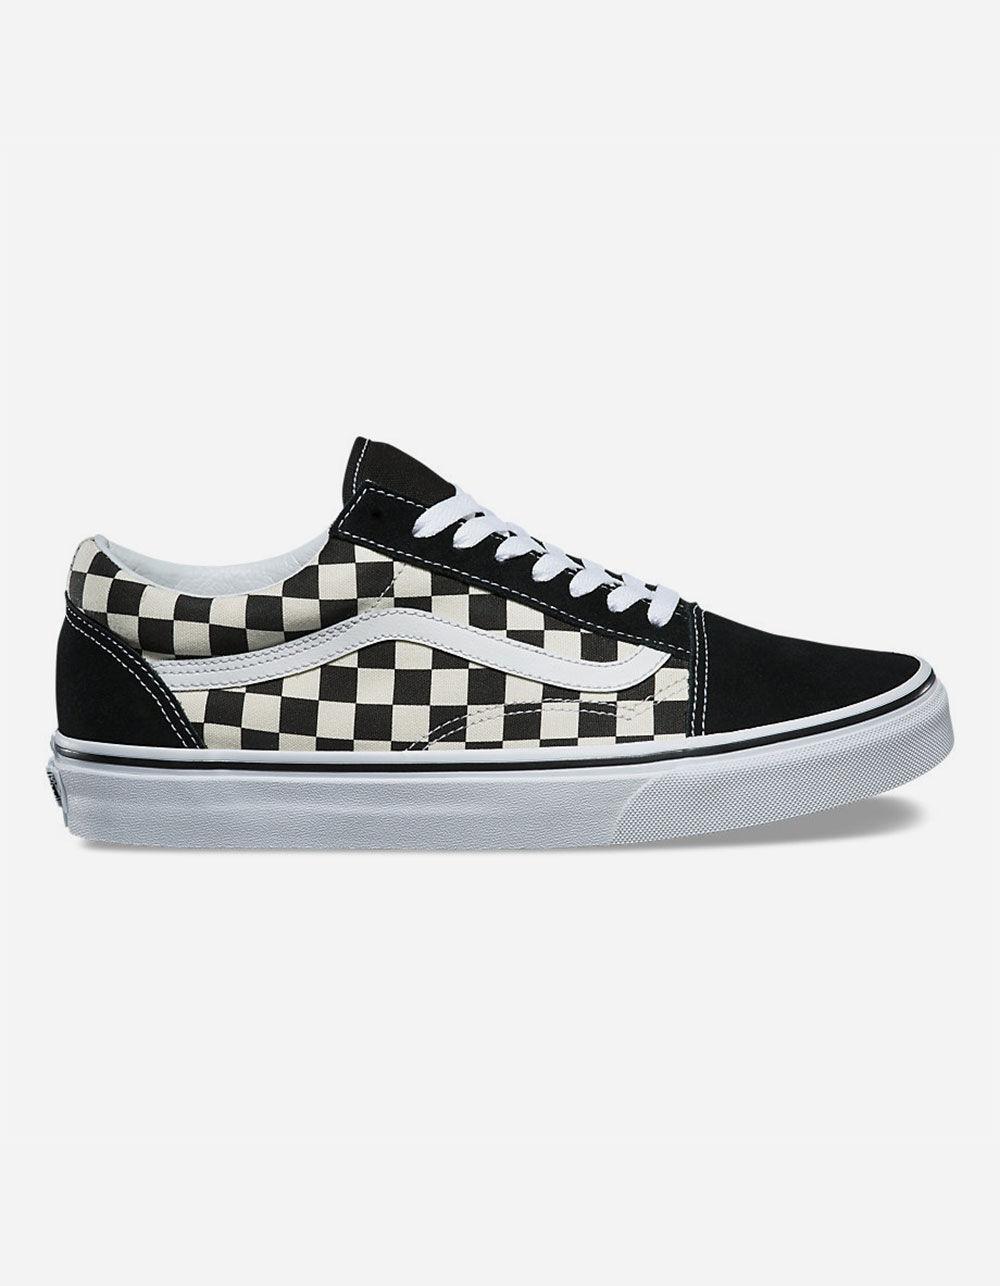 VANS Checkered Old Skool Black & White Shoes